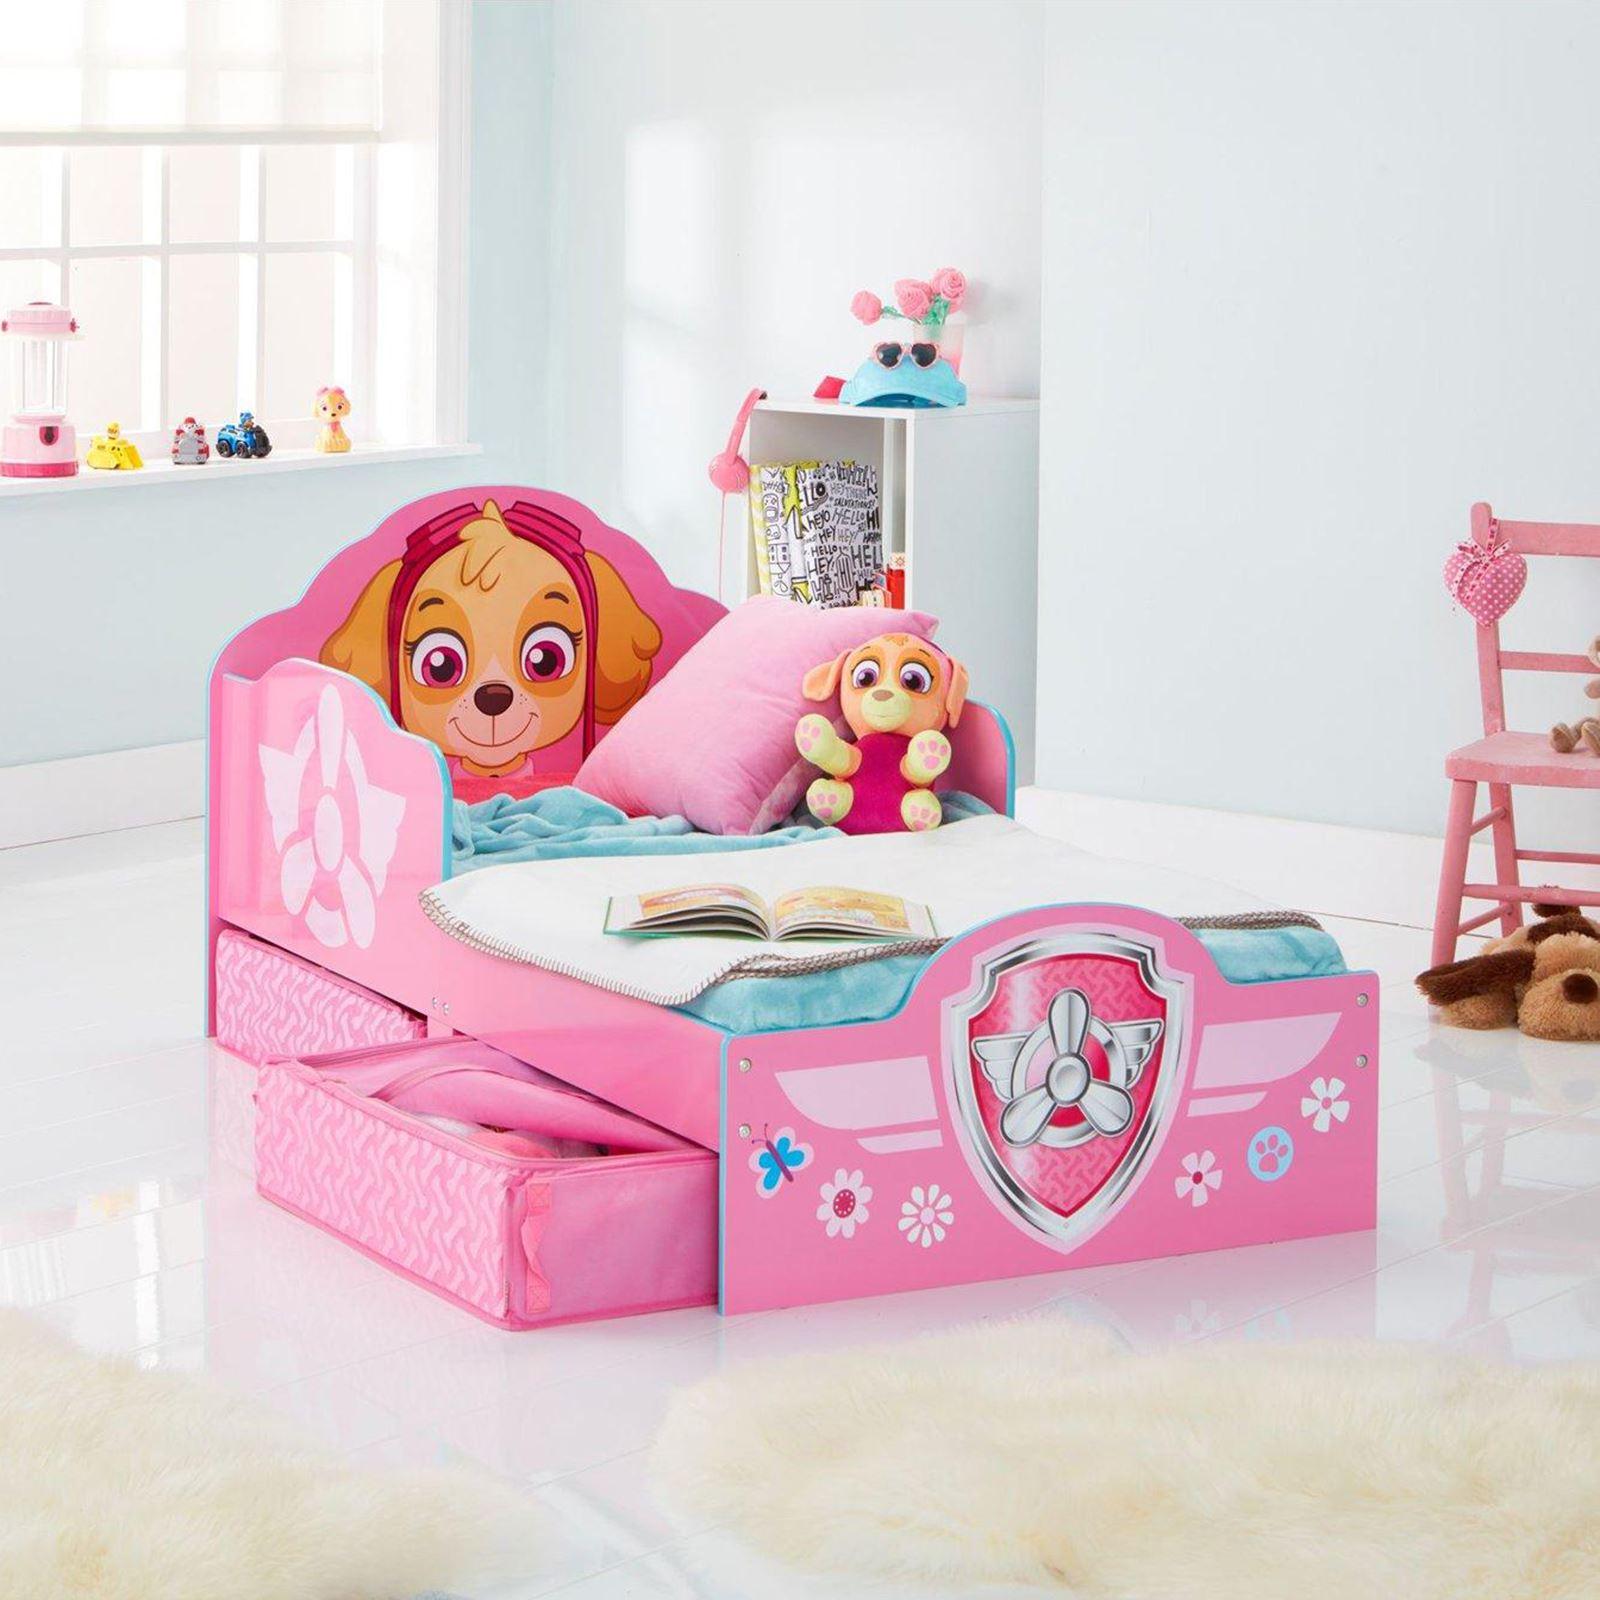 Disney personnage b b junior lits avec rangement 3 options de matelas ebay - Lit bebe disney ...